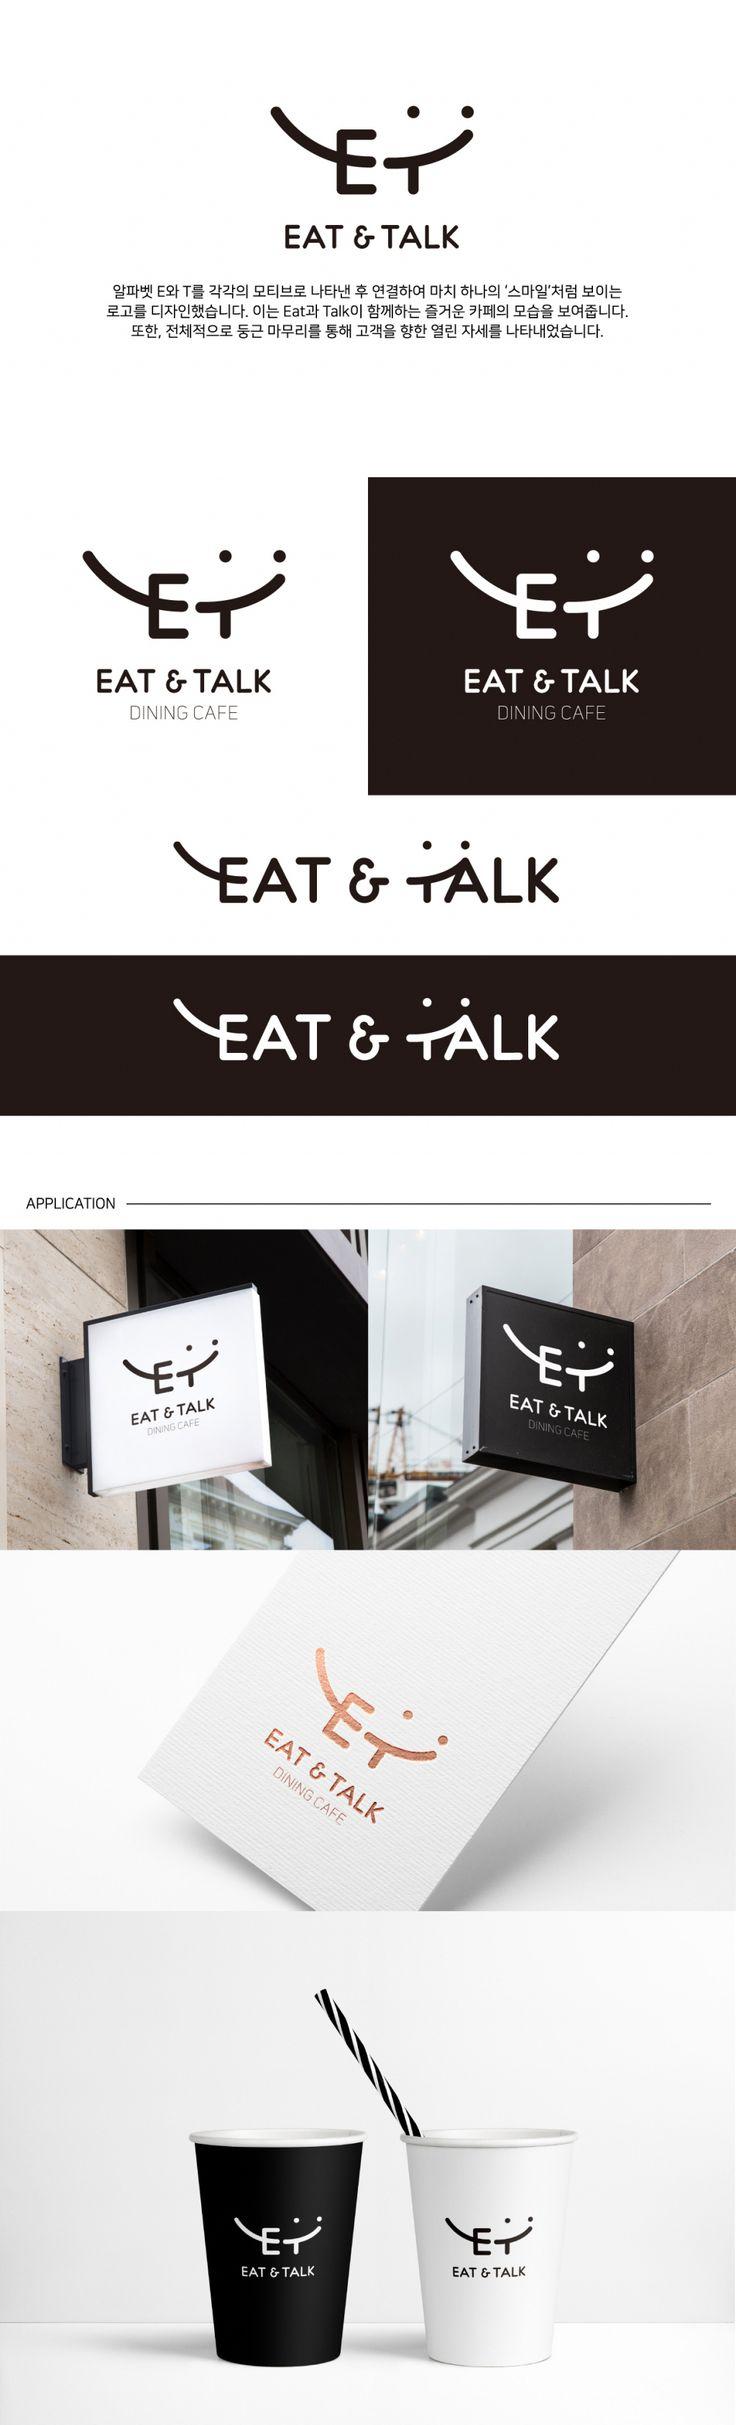 ET(EAT&TALK) / Design by hjin730 / EAT&TALK의 먹는다는 의미를 E와 포크 형상으로 표현하고, 대화하다는 의미를 T와 두 사람이 마주보는 형태를 결합한 재치있는 아이디어의 우승작입니다! #로고디자인 #ET #EAT&TALK #카페 #커피 #커피숍 #coffee #브랜딩 #브랜딩디자인 #브랜드디자인 #BI #라우드소싱 #디자인의뢰 #디자인 #디자이너 #로고 #logo #logodesign #design #심볼 #디자인공모전 #공모전